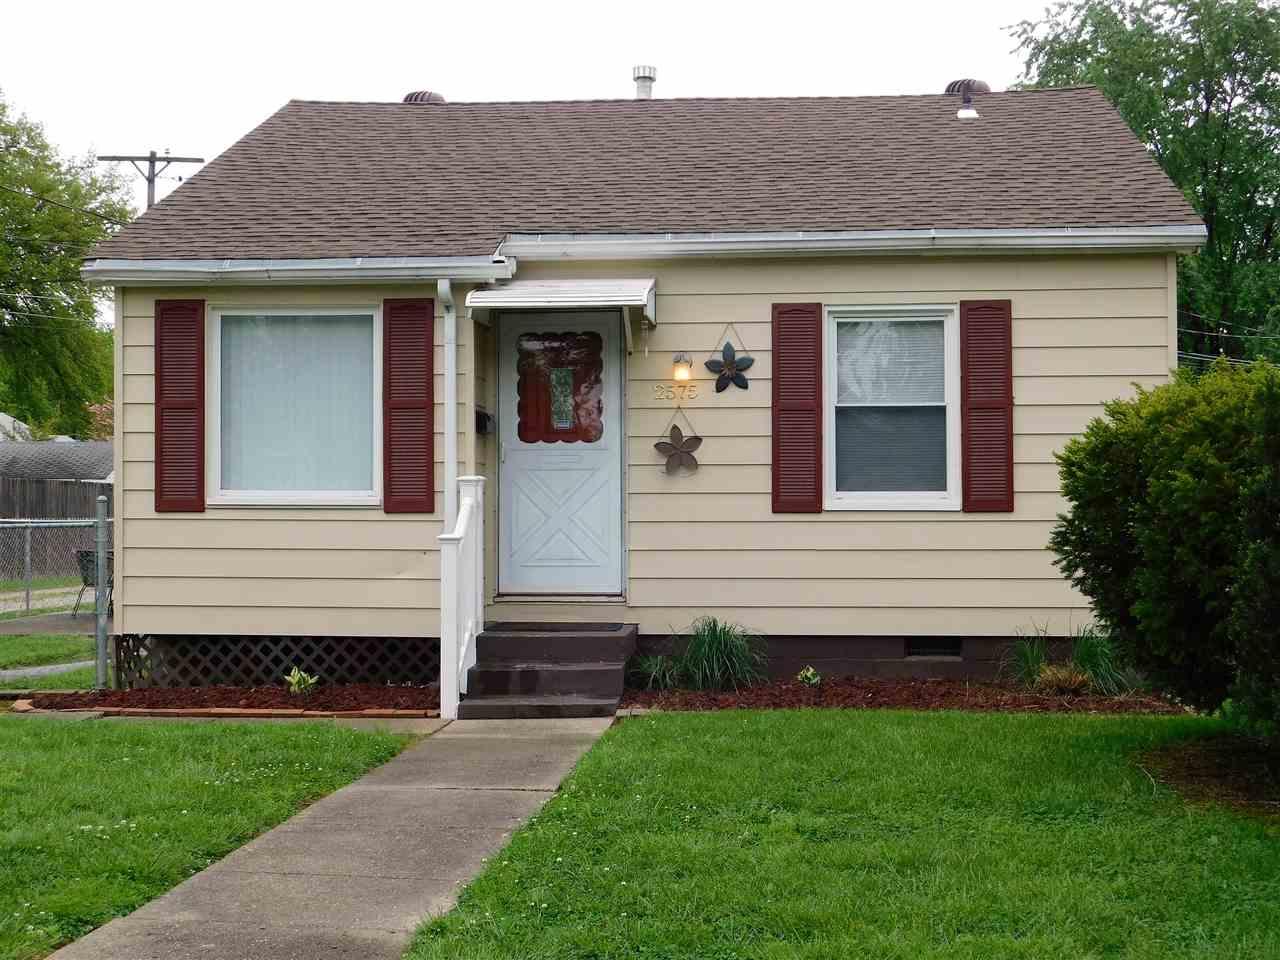 2575 N Longworth Court, Evansville, IN 47711